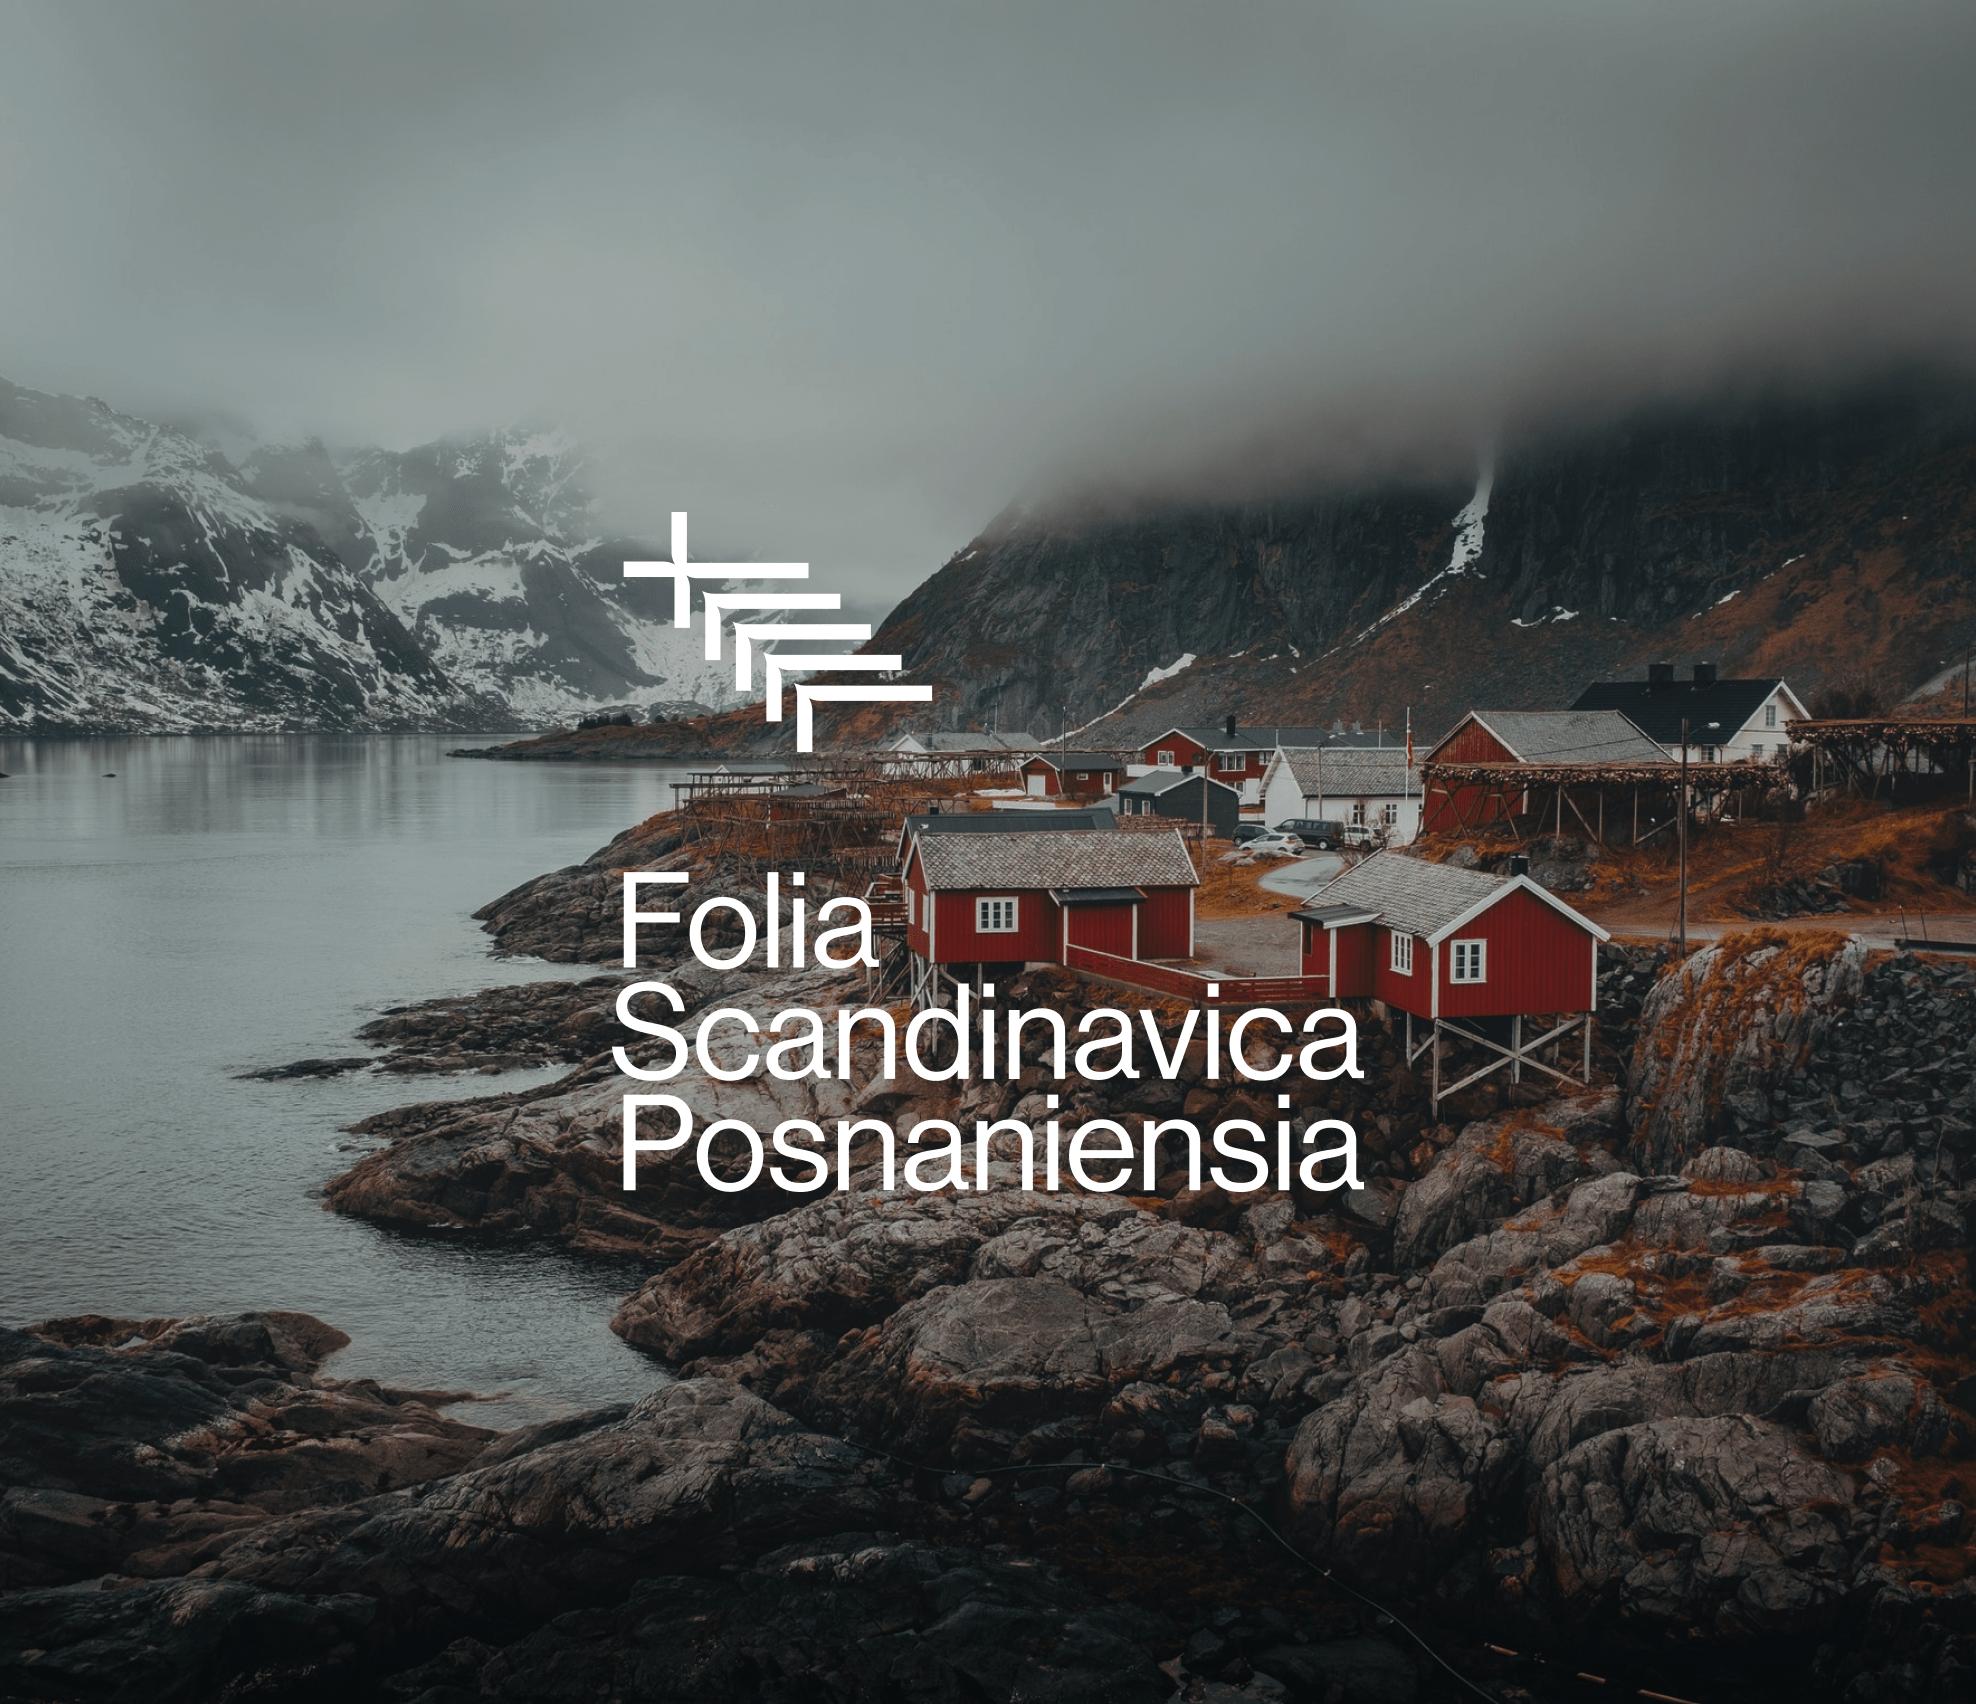 Logo on picture background - Folia Scandinavica Posnaniensia